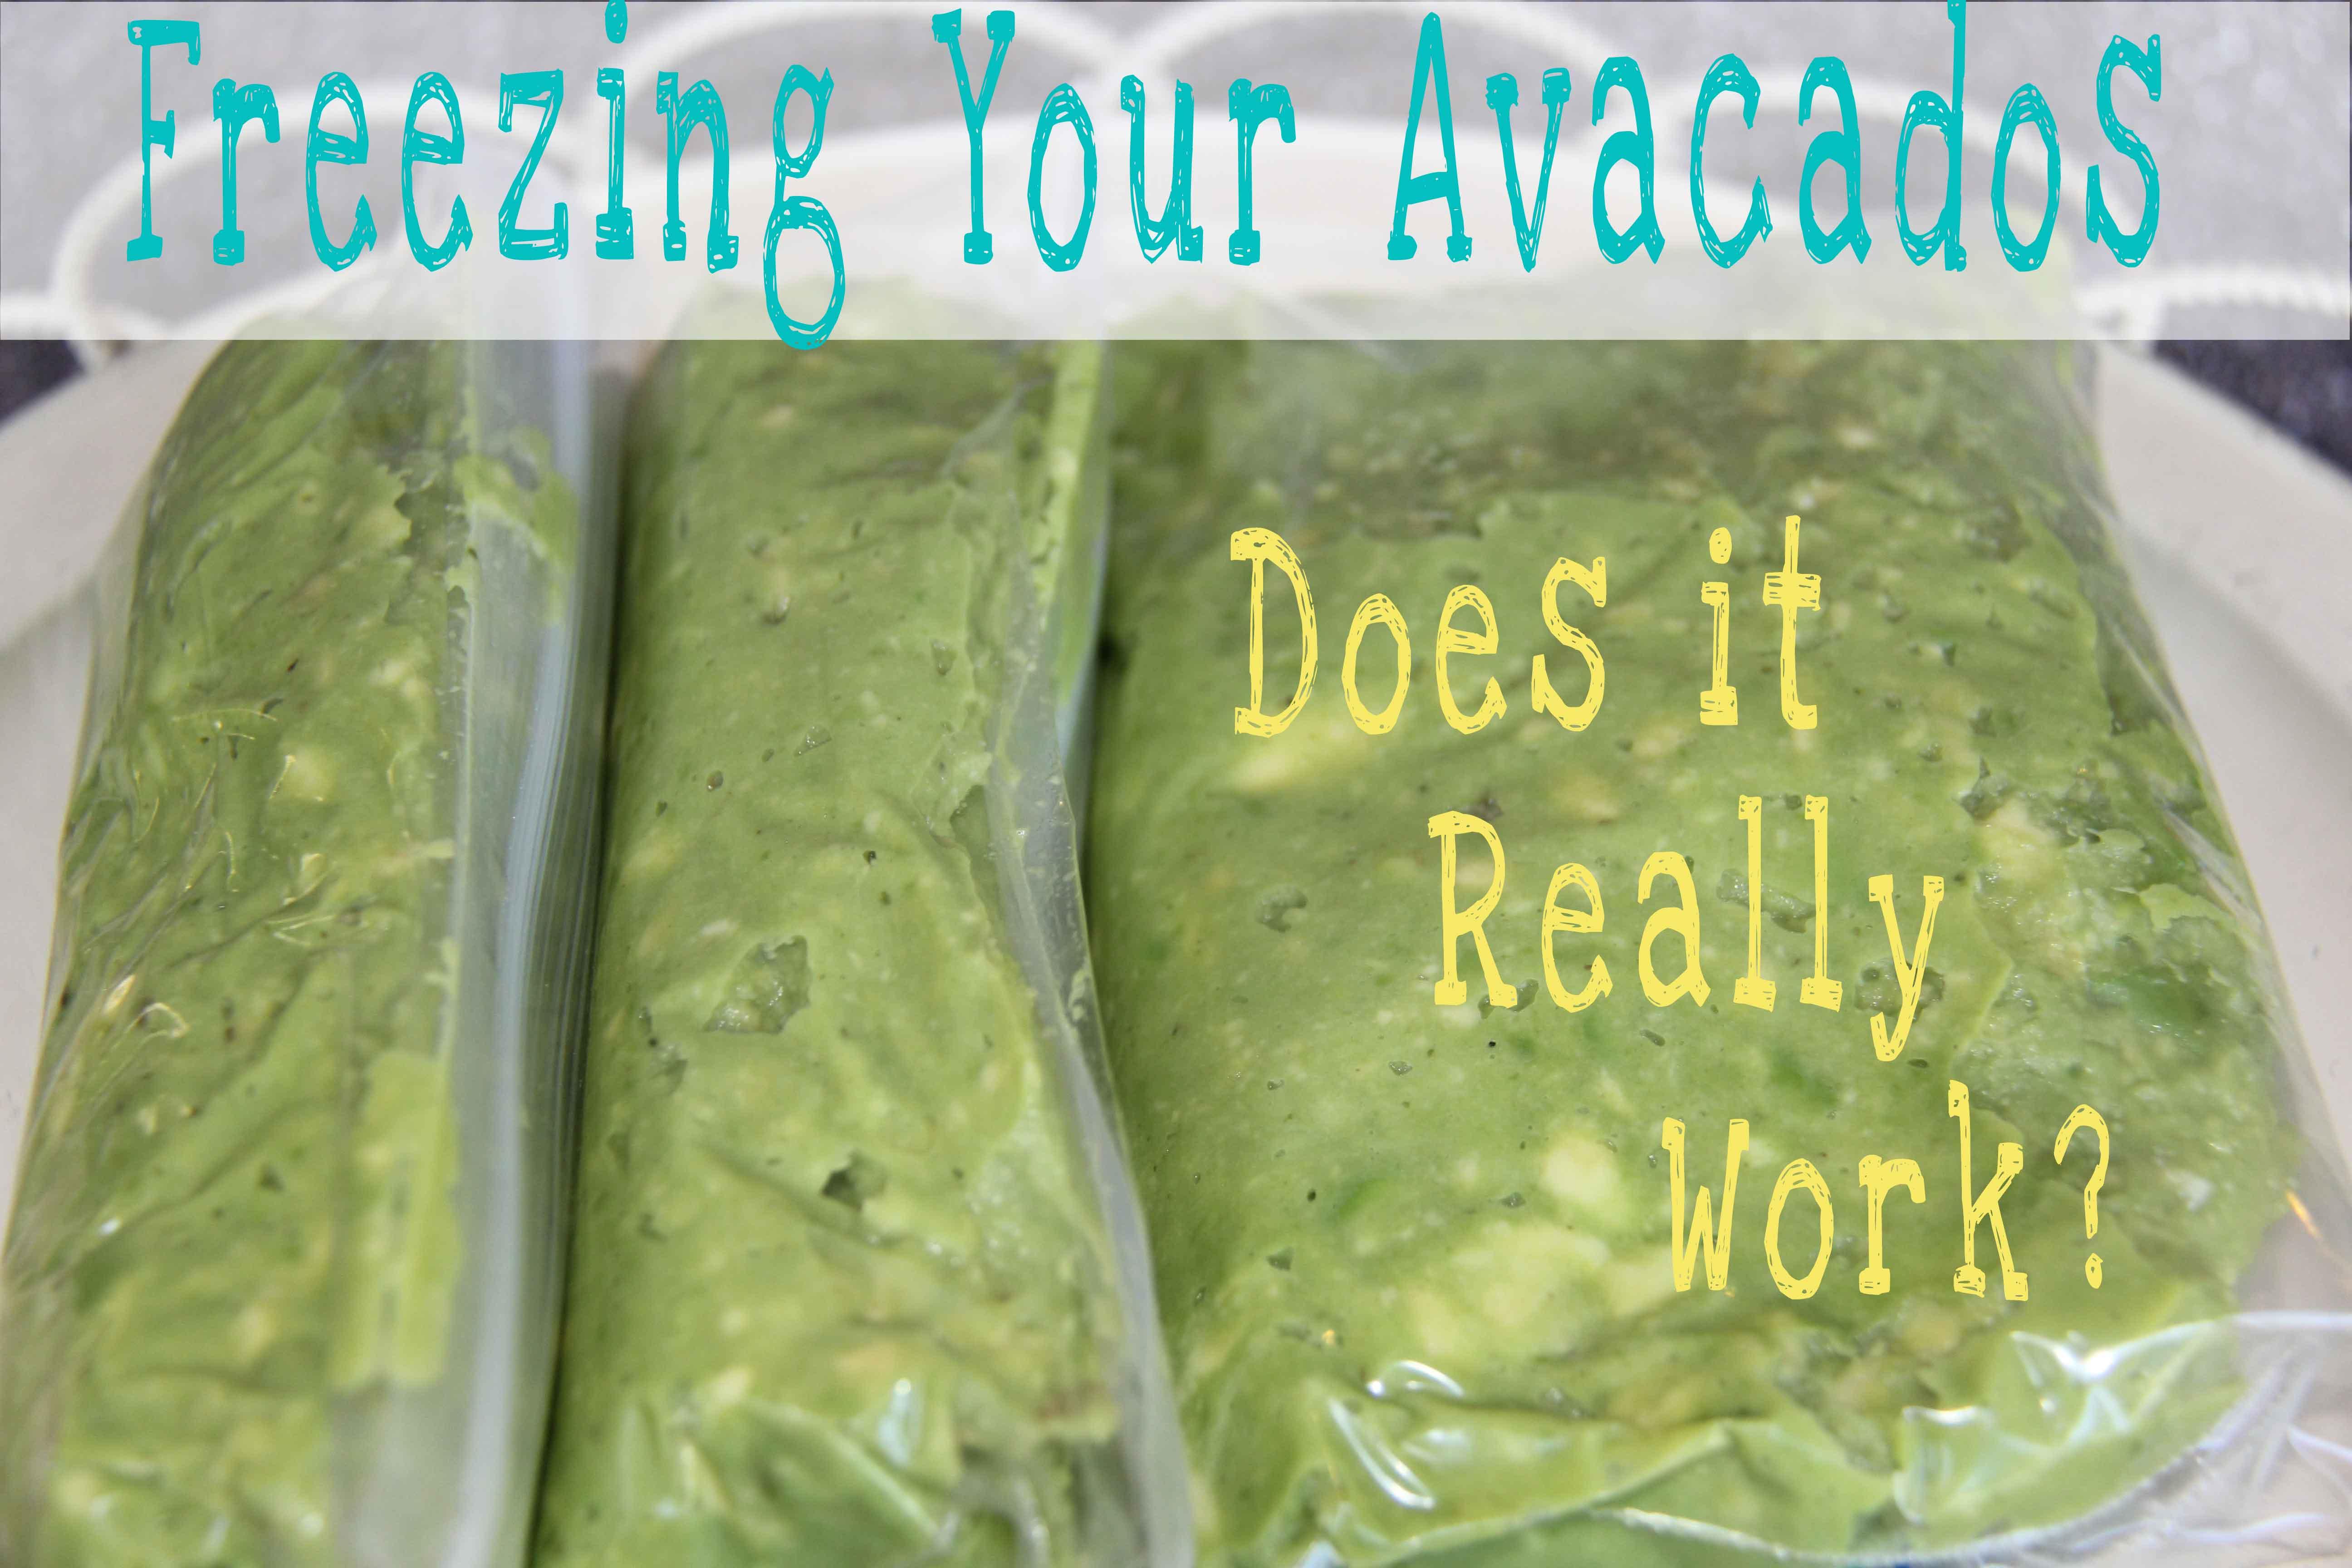 marvelous frozen avocado Part - 4: marvelous frozen avocado pictures